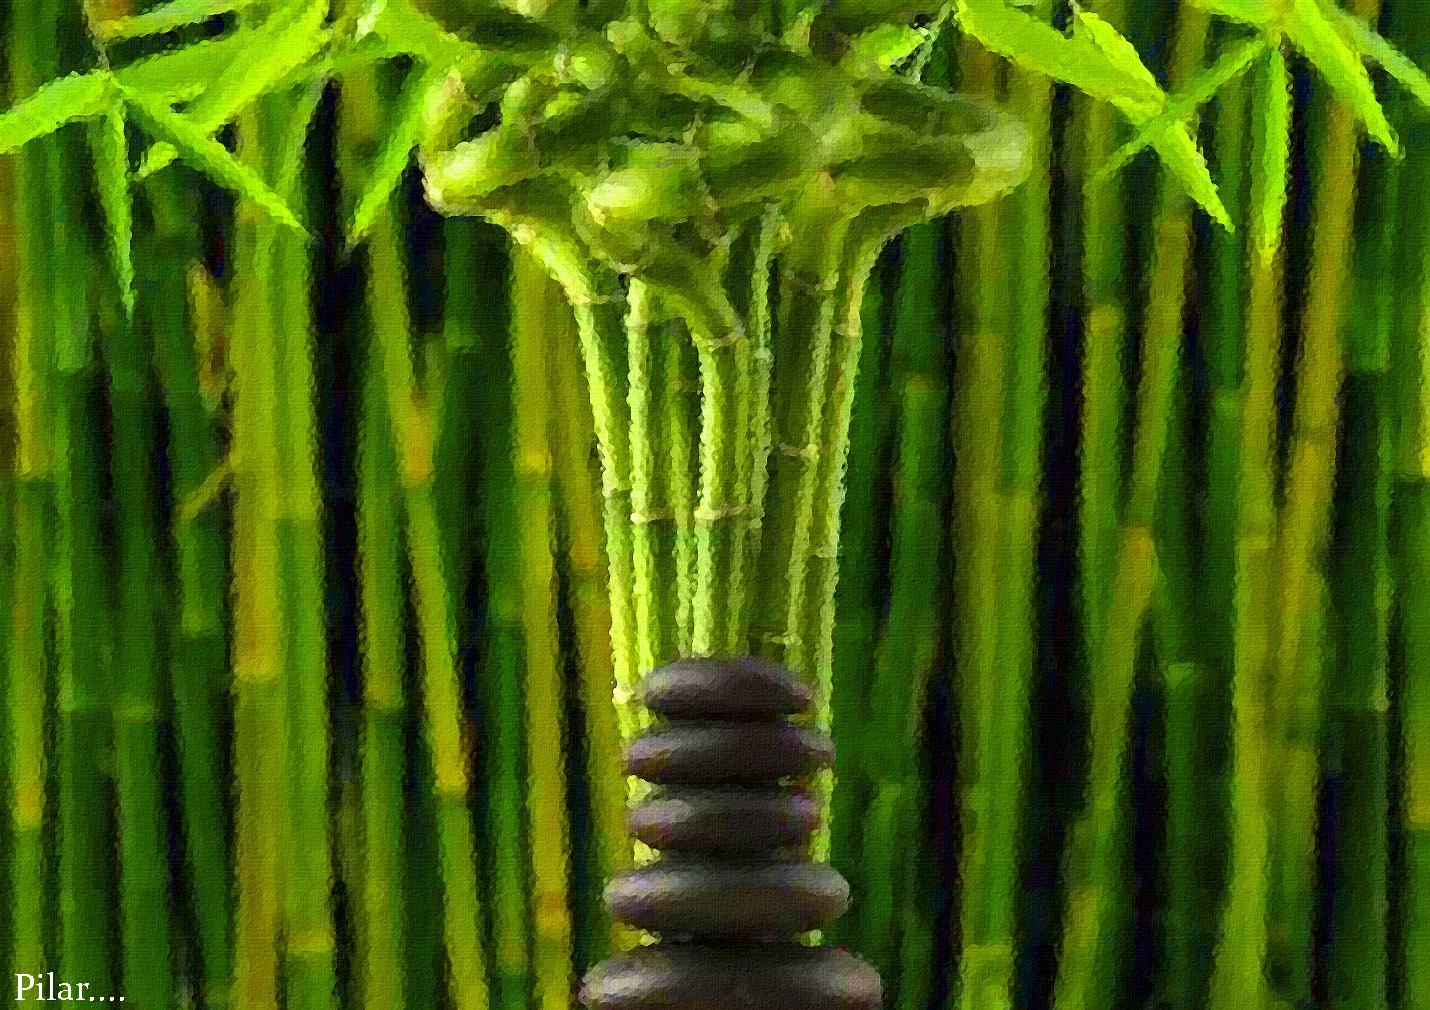 Bambu Baño Feng Shui:PILAR Y SUS COMPLICES: BAMBU